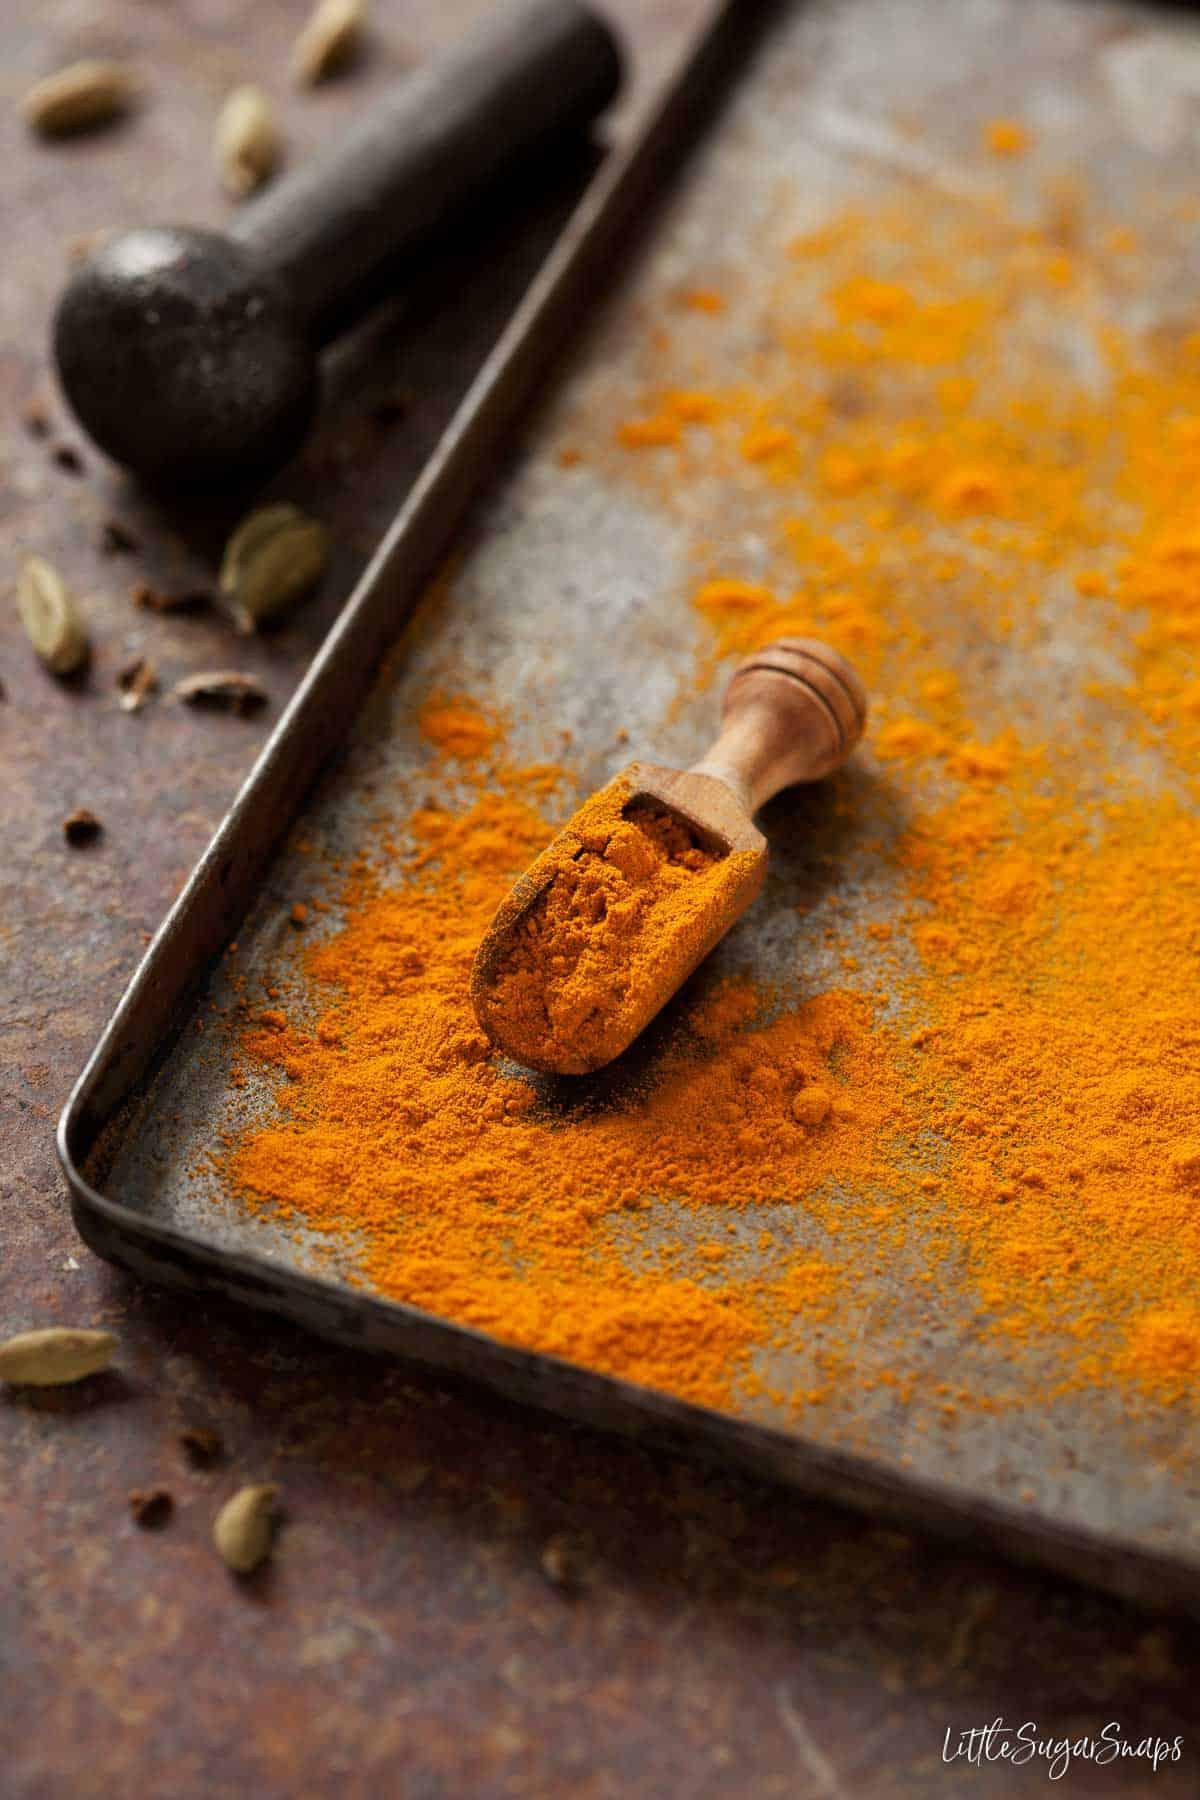 Ground turmeric spice on a baking tin